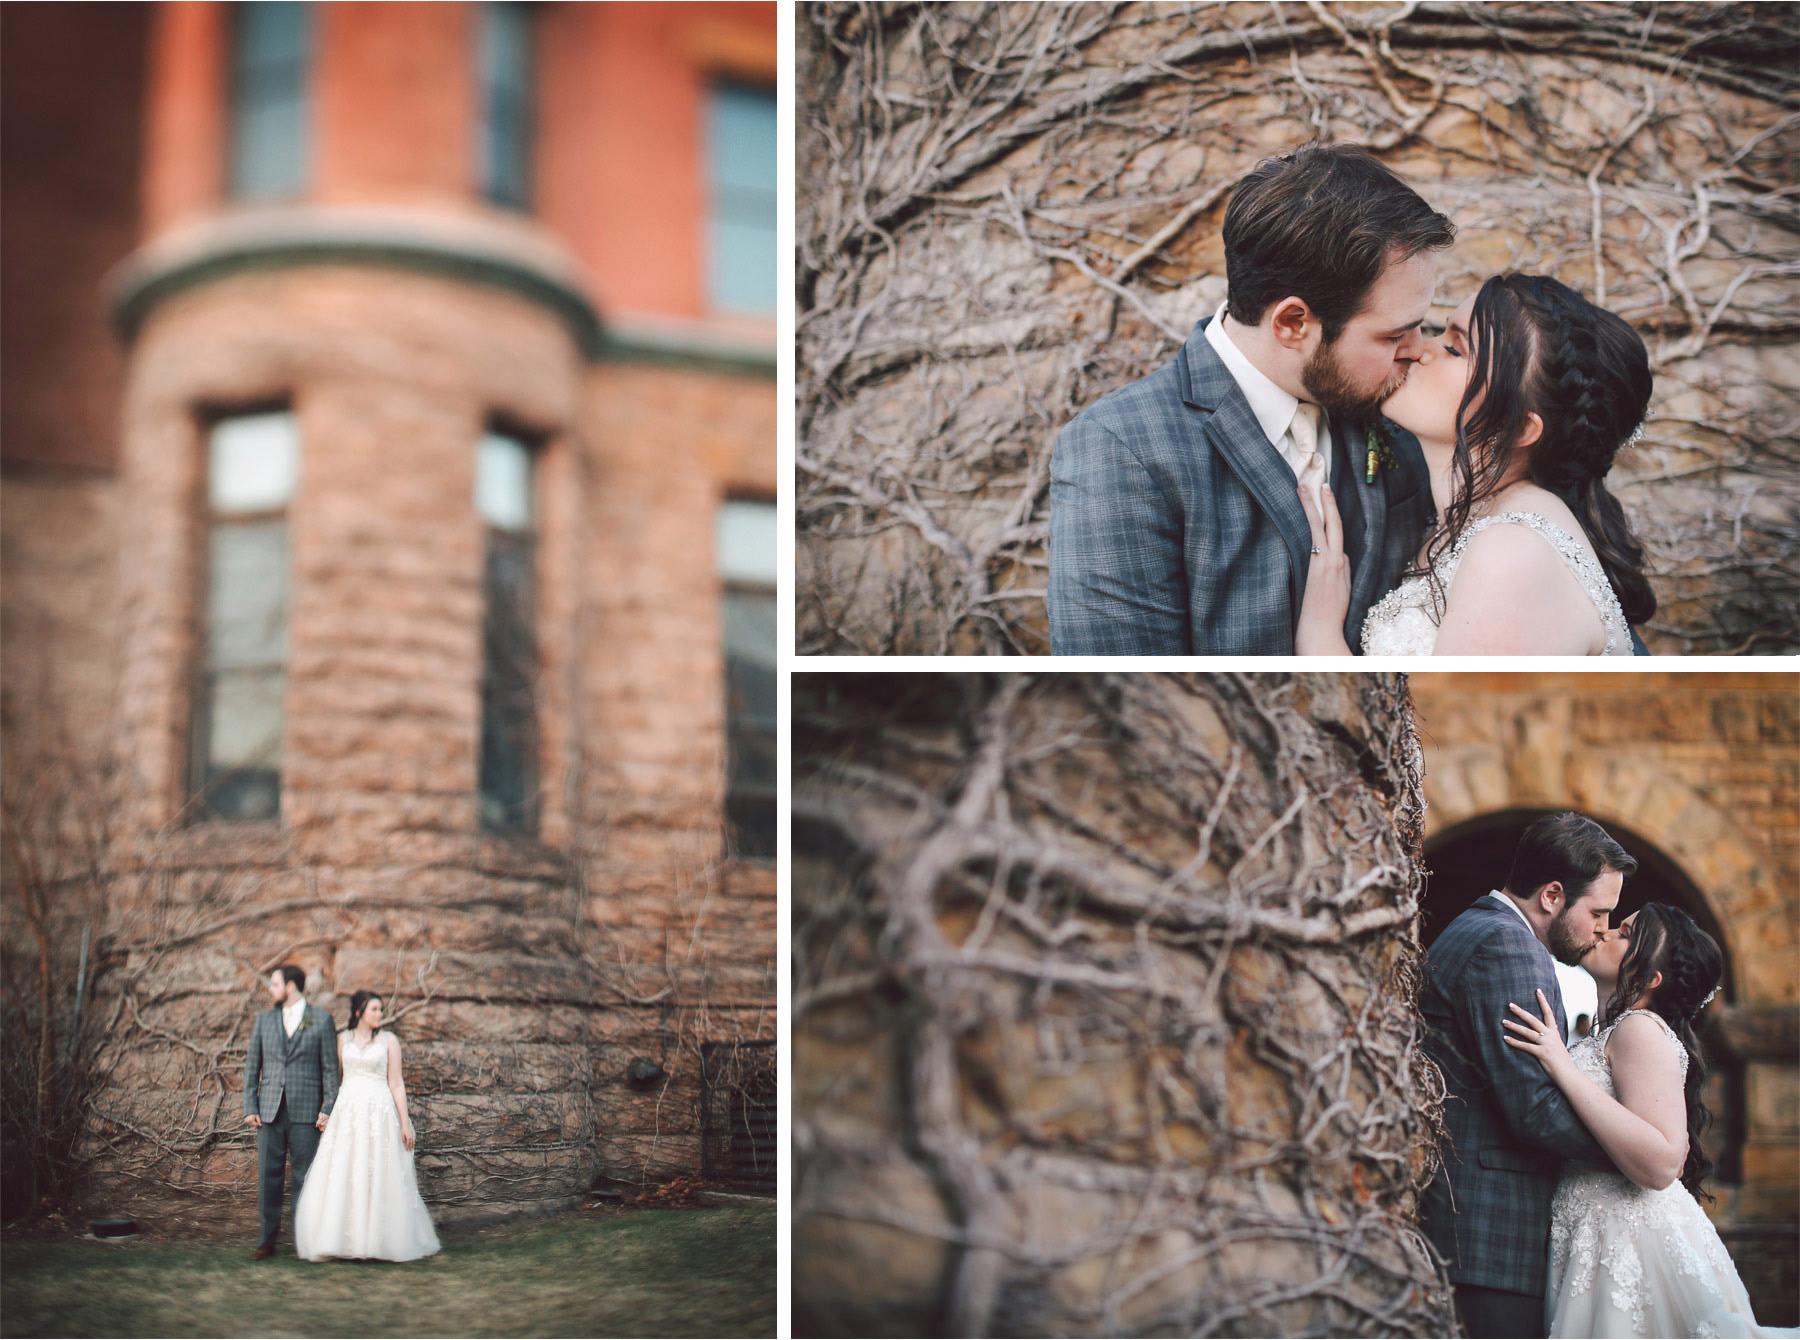 18-Minneapolis-Wedding-Photography-by-Vick-Photography-Historic-Concord-Exchange-Rachael-and-Benjamin.jpg